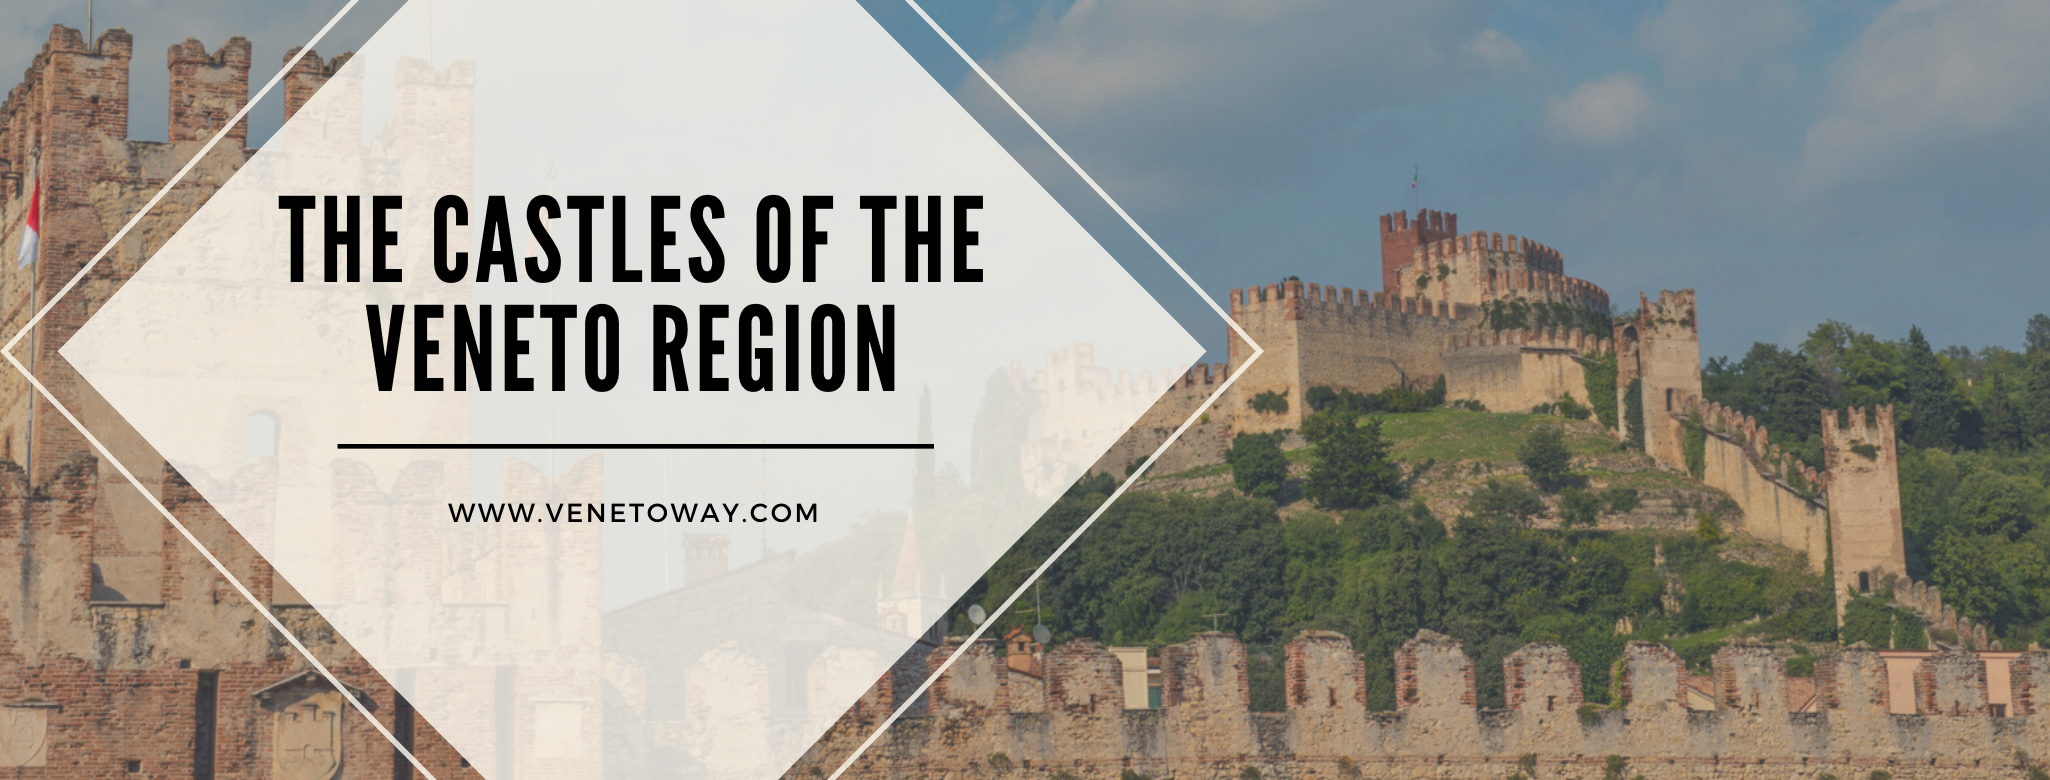 The Castles of the Veneto Region